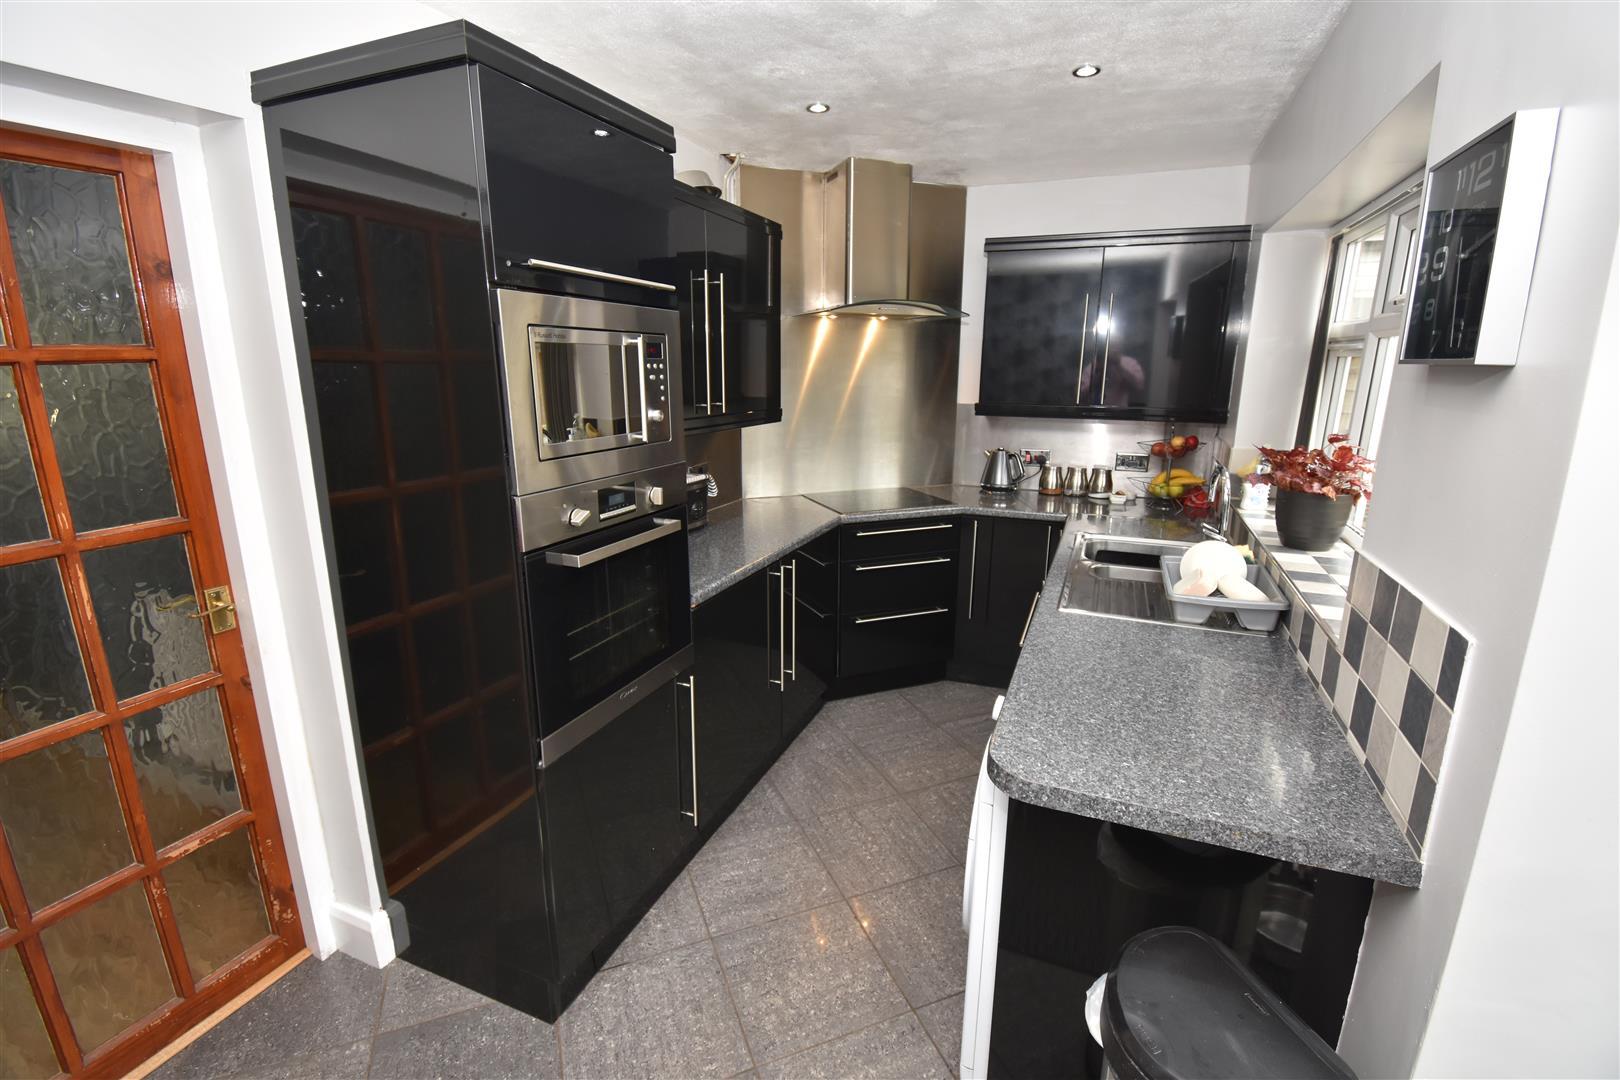 3 bed house for sale in Drews Lane, Birmingham B8 2SL 2